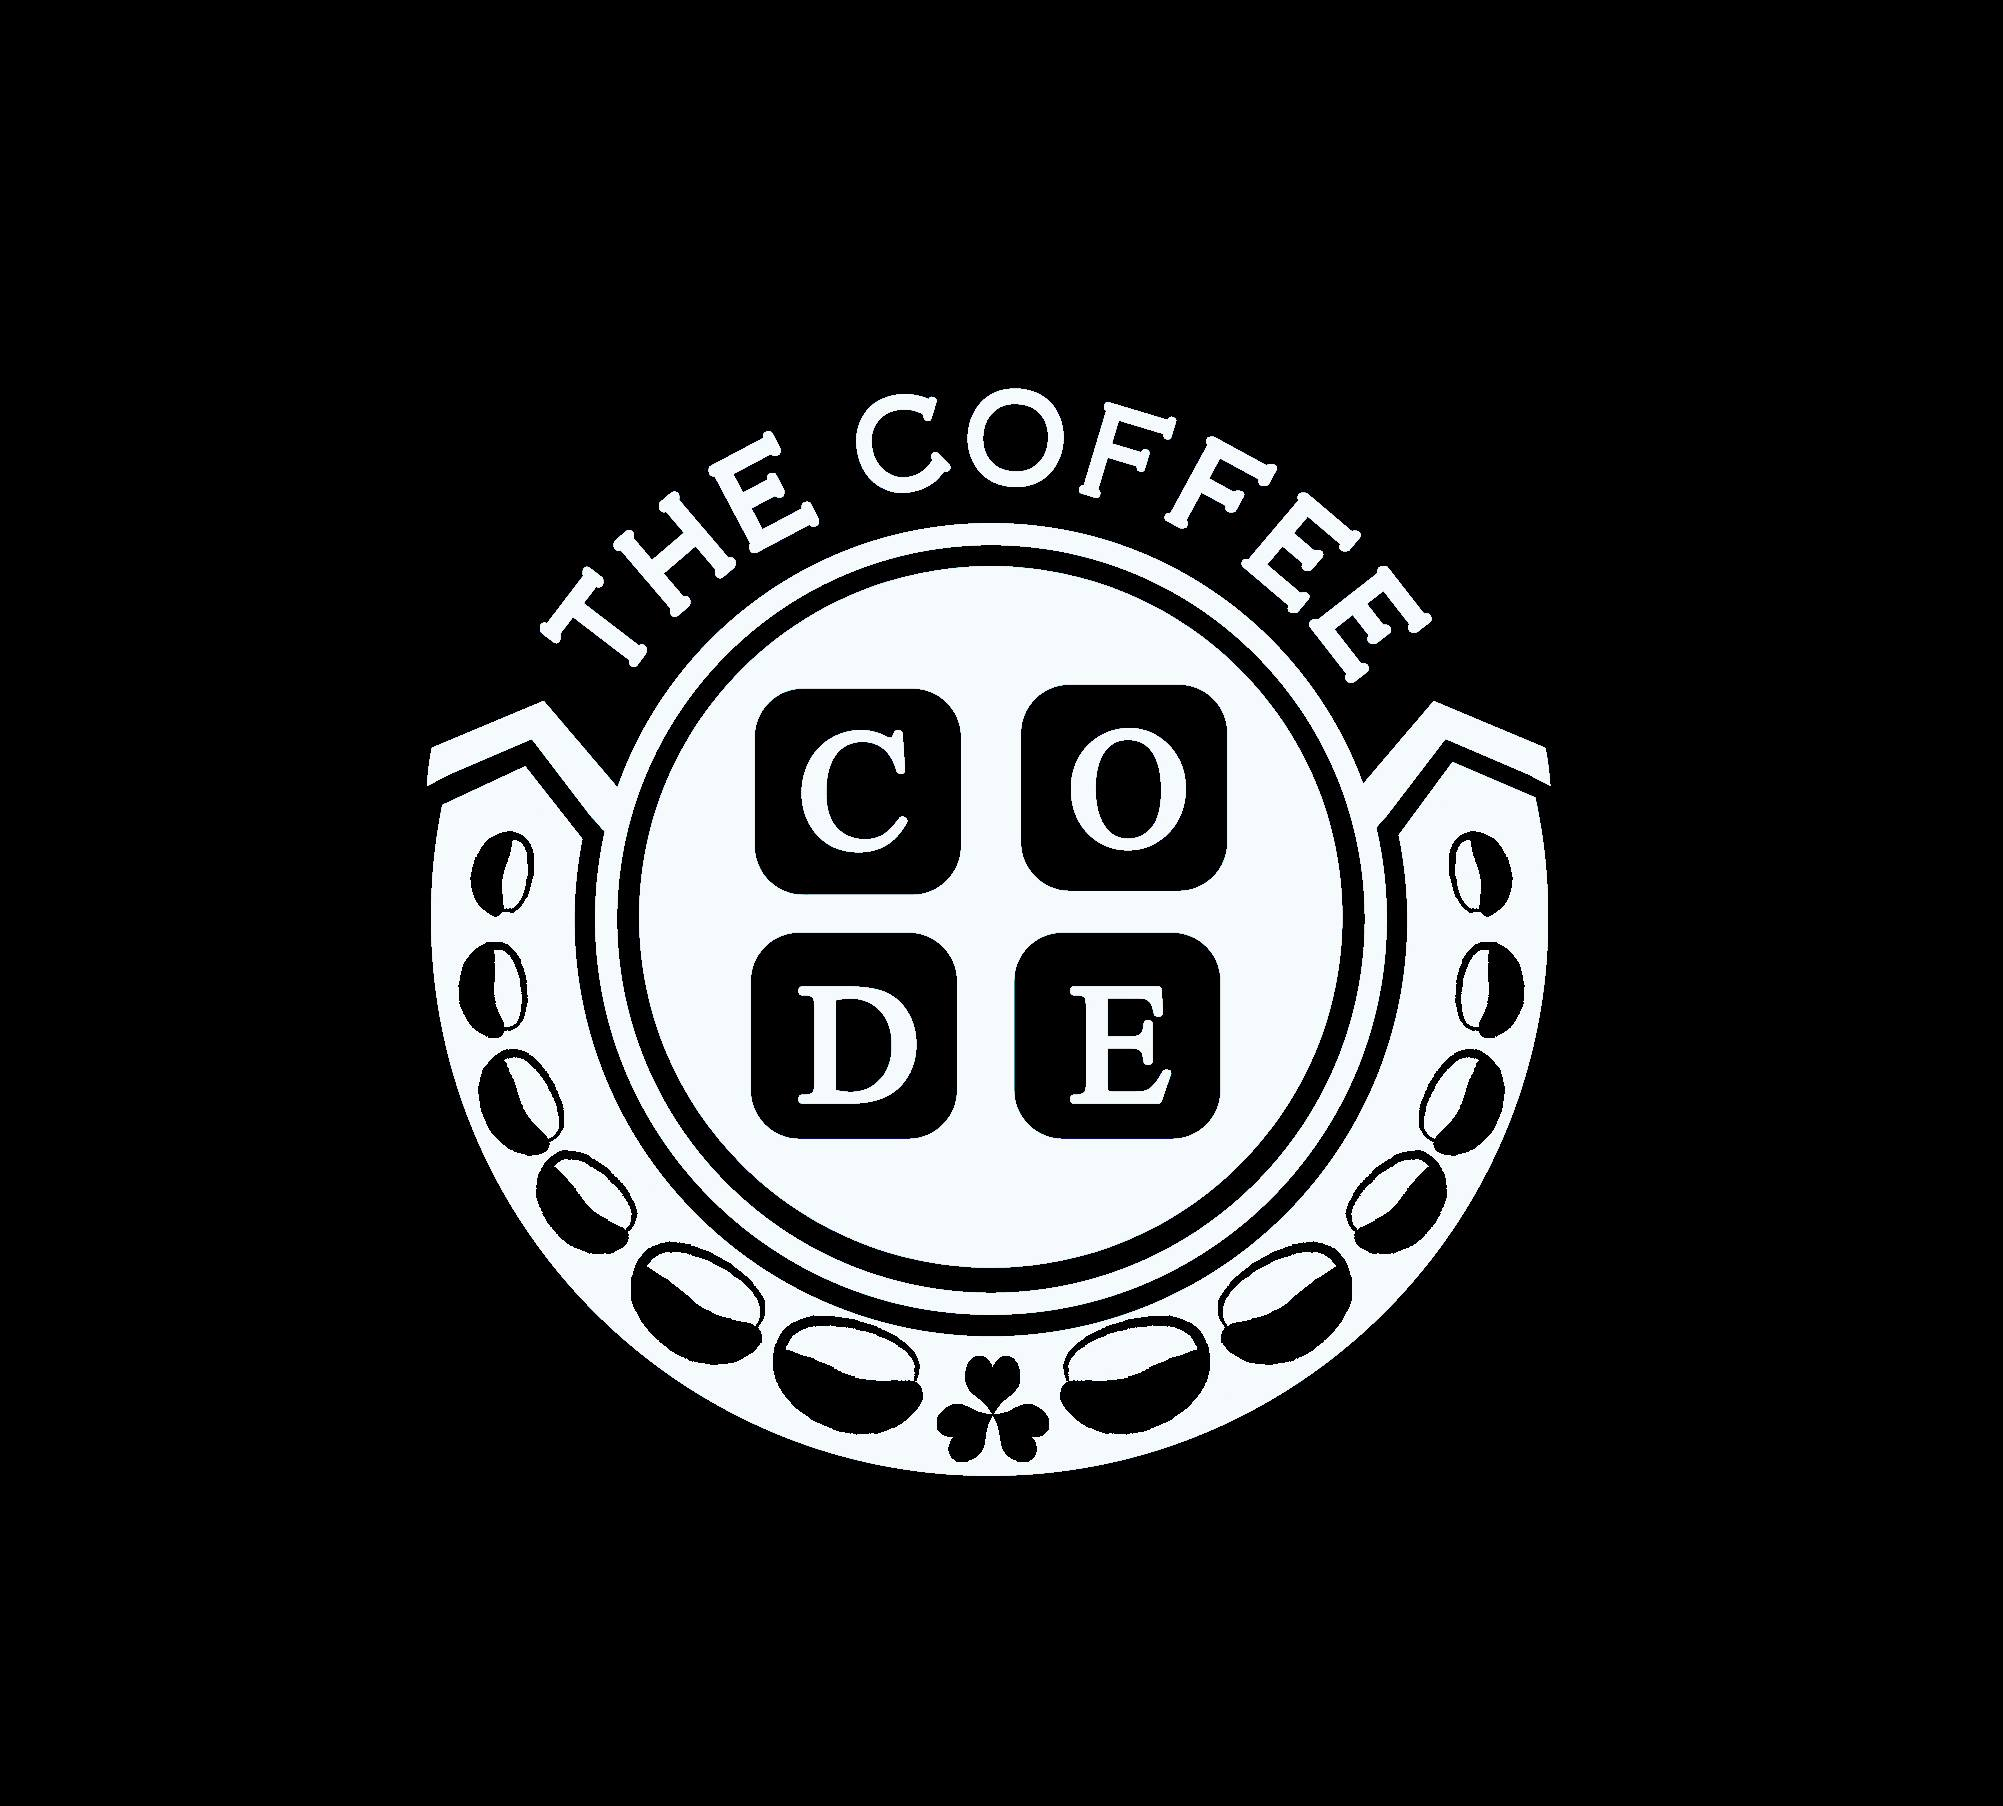 THE COFFEE CODE